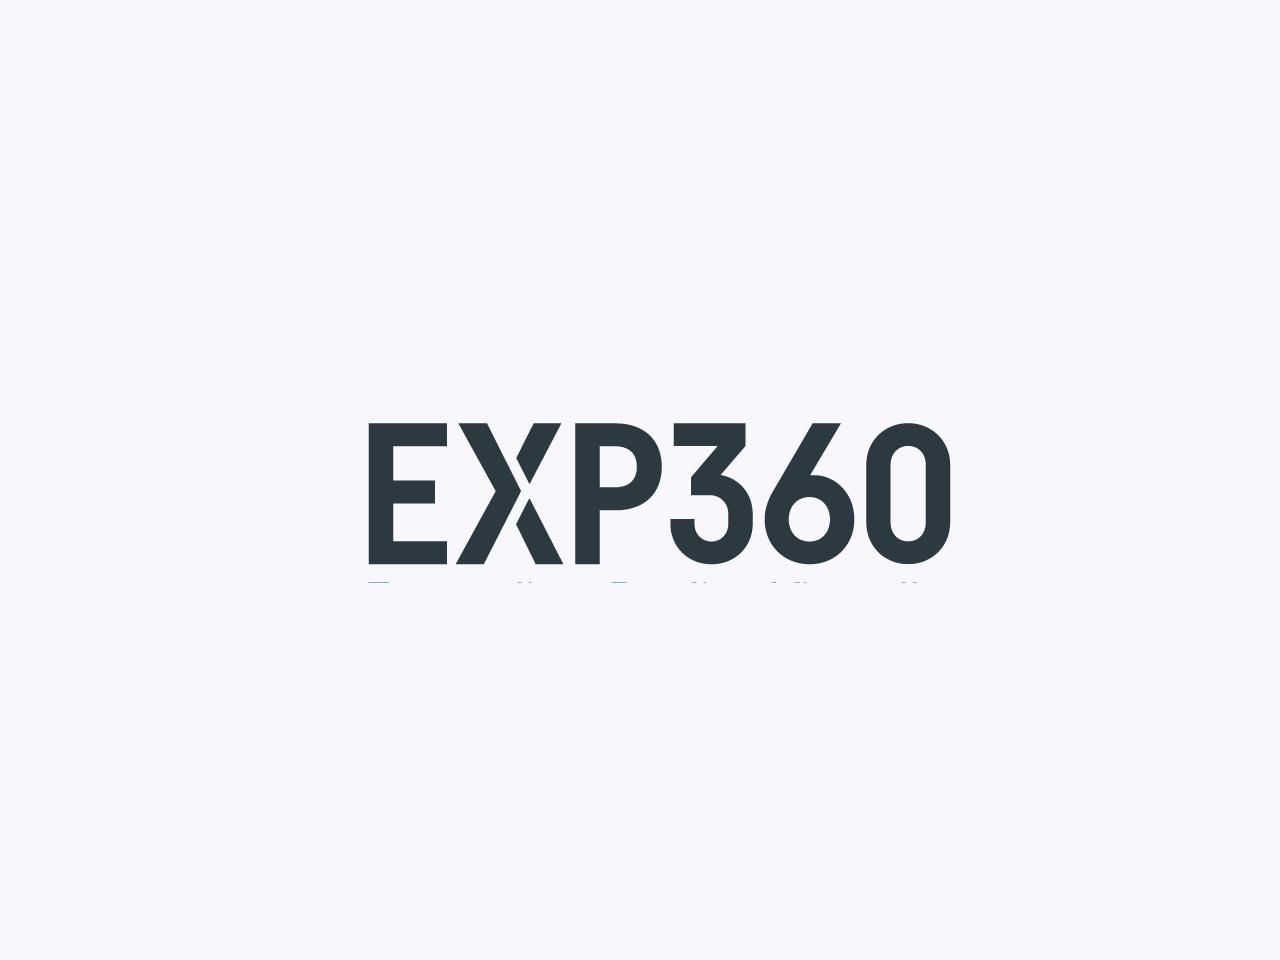 Exp360